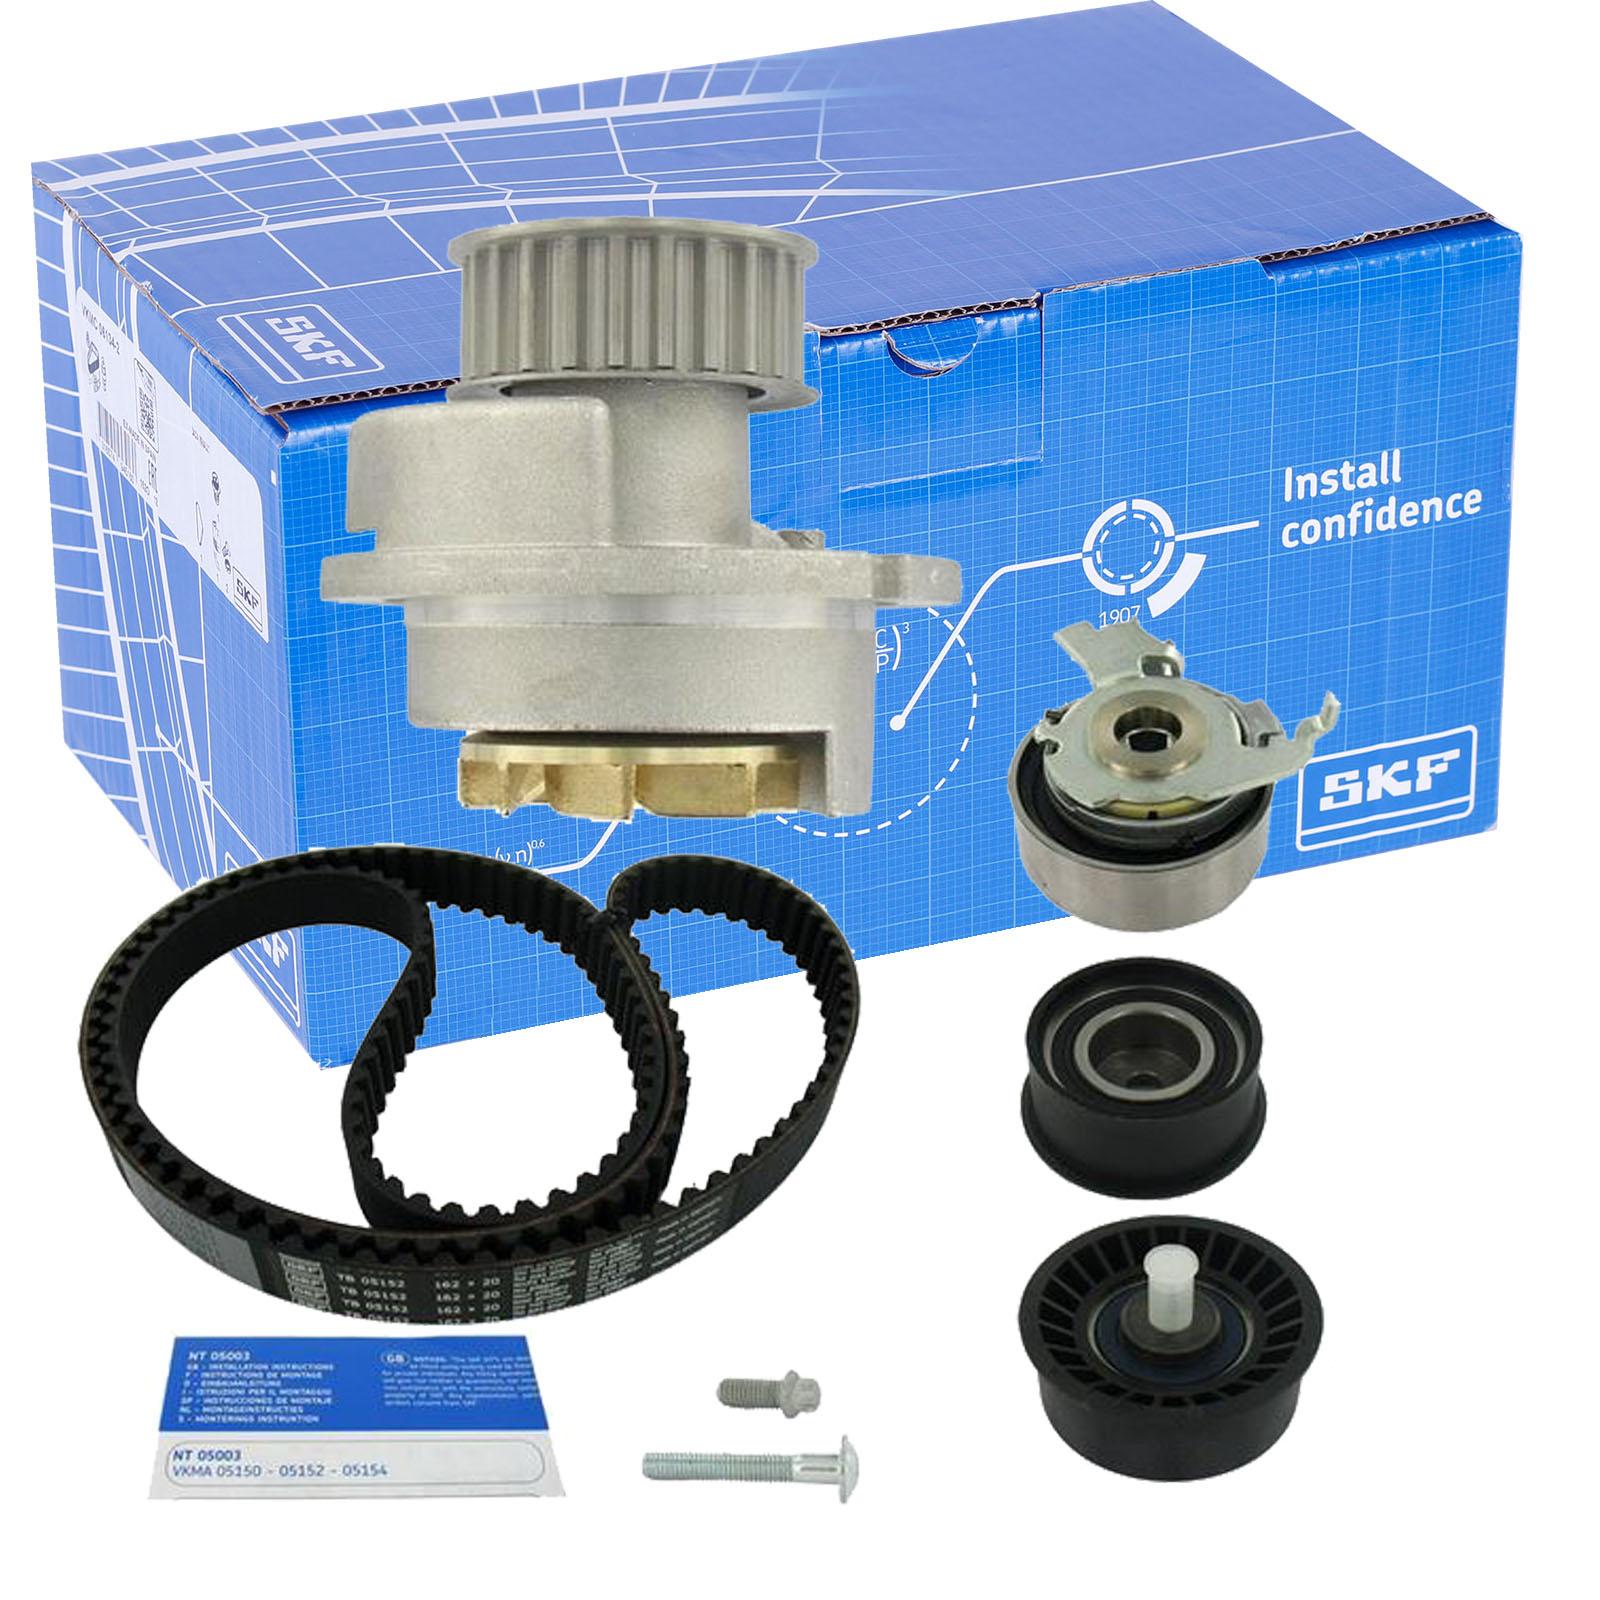 SKF VKMC 01998 Spannrollensatz inkl Wasserpumpe